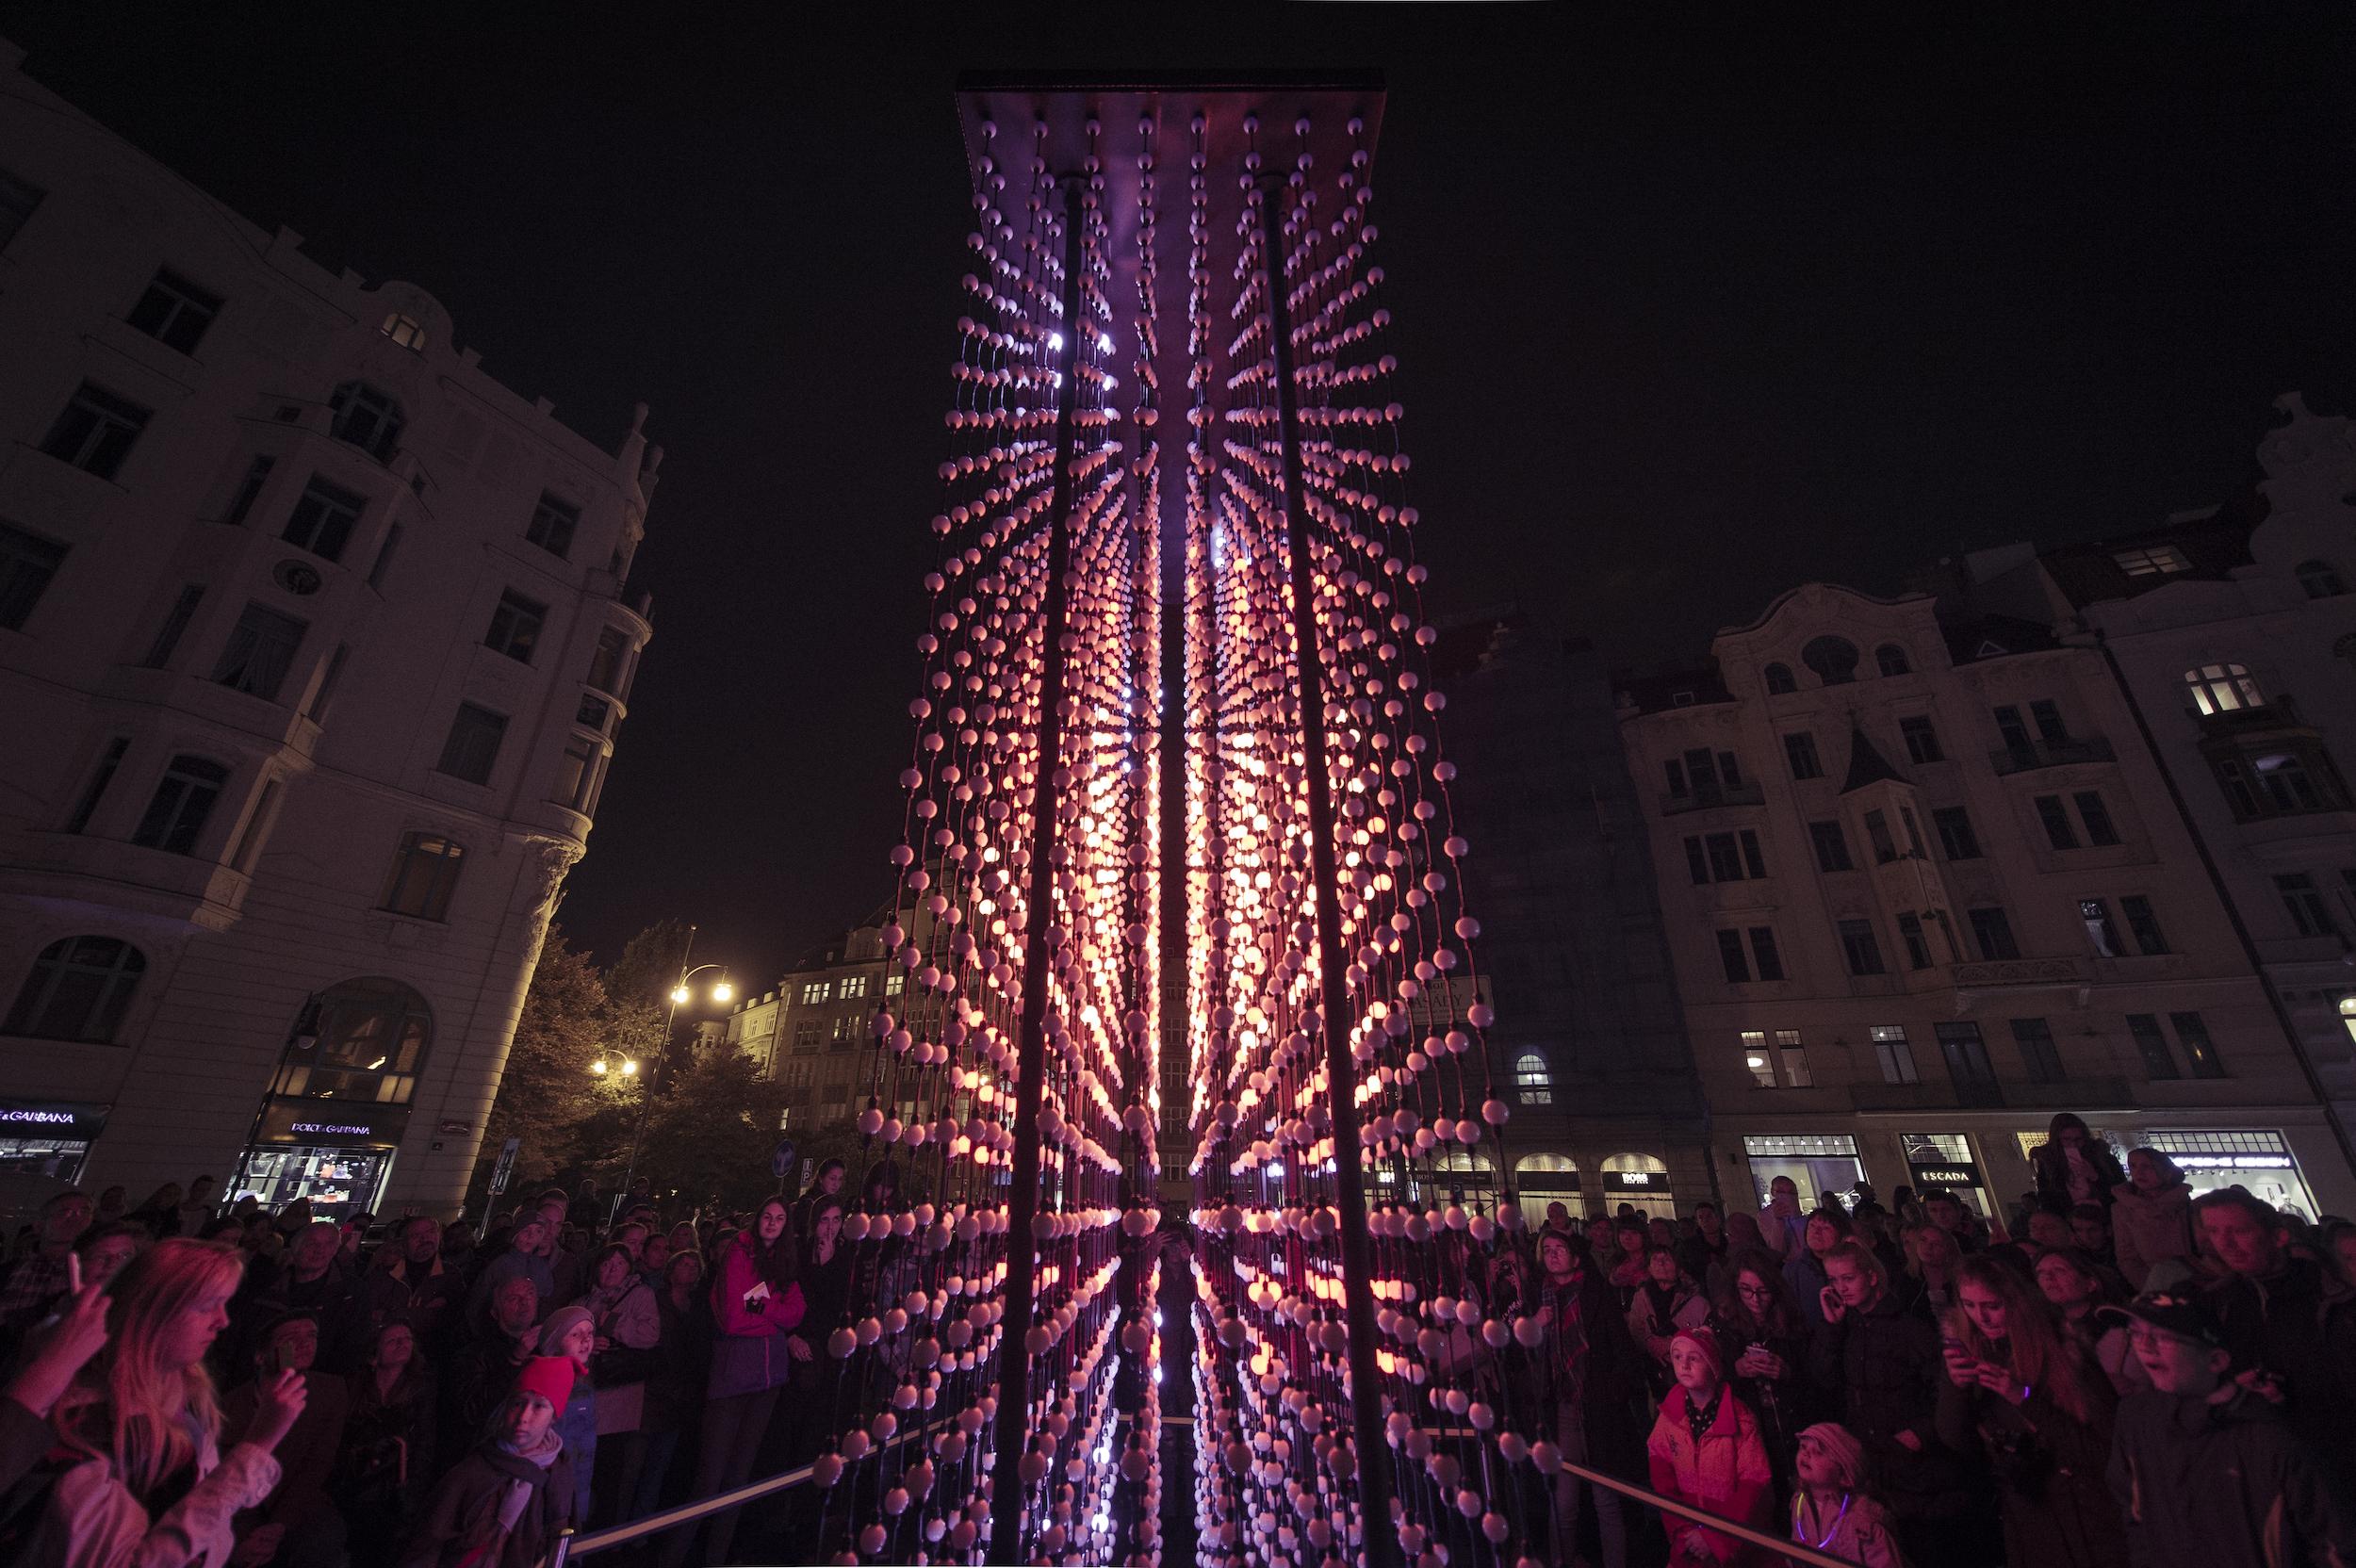 monolith-powered-by-mercedes_benz_hyperbinary_photocredit_alexander_dobrovodsky